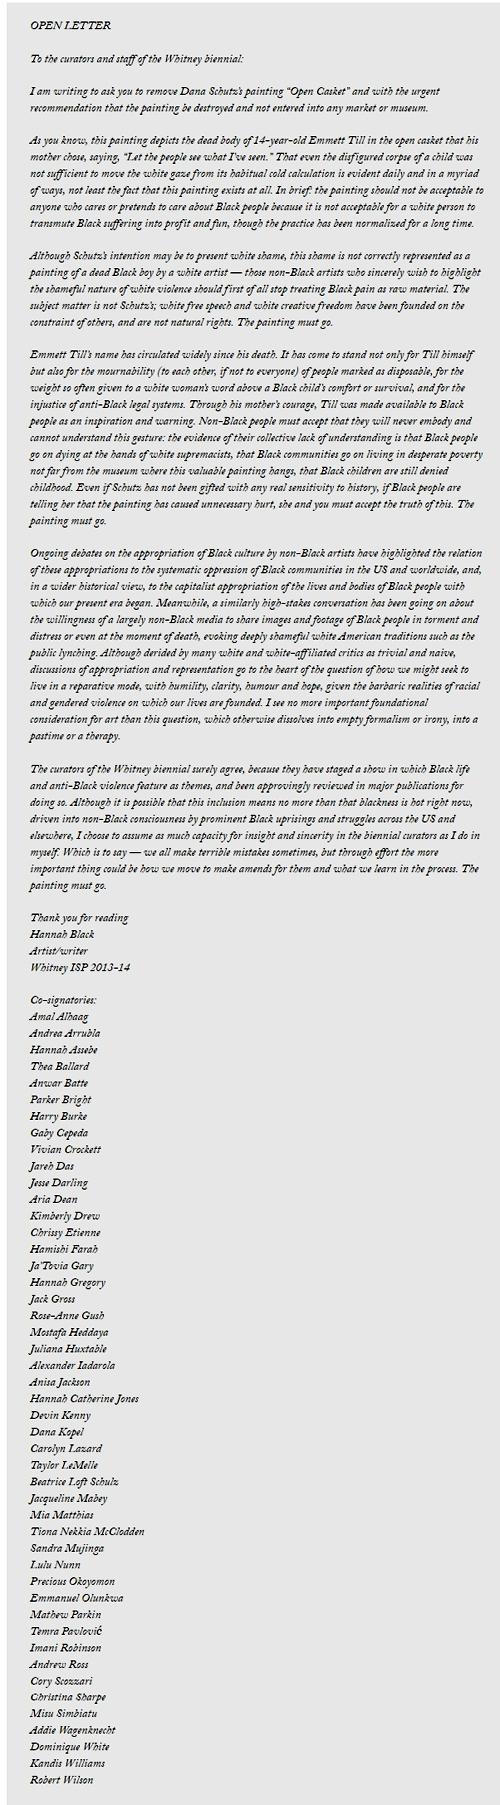 Hannah Black letter open casket painting controversy publicada en ArtNews